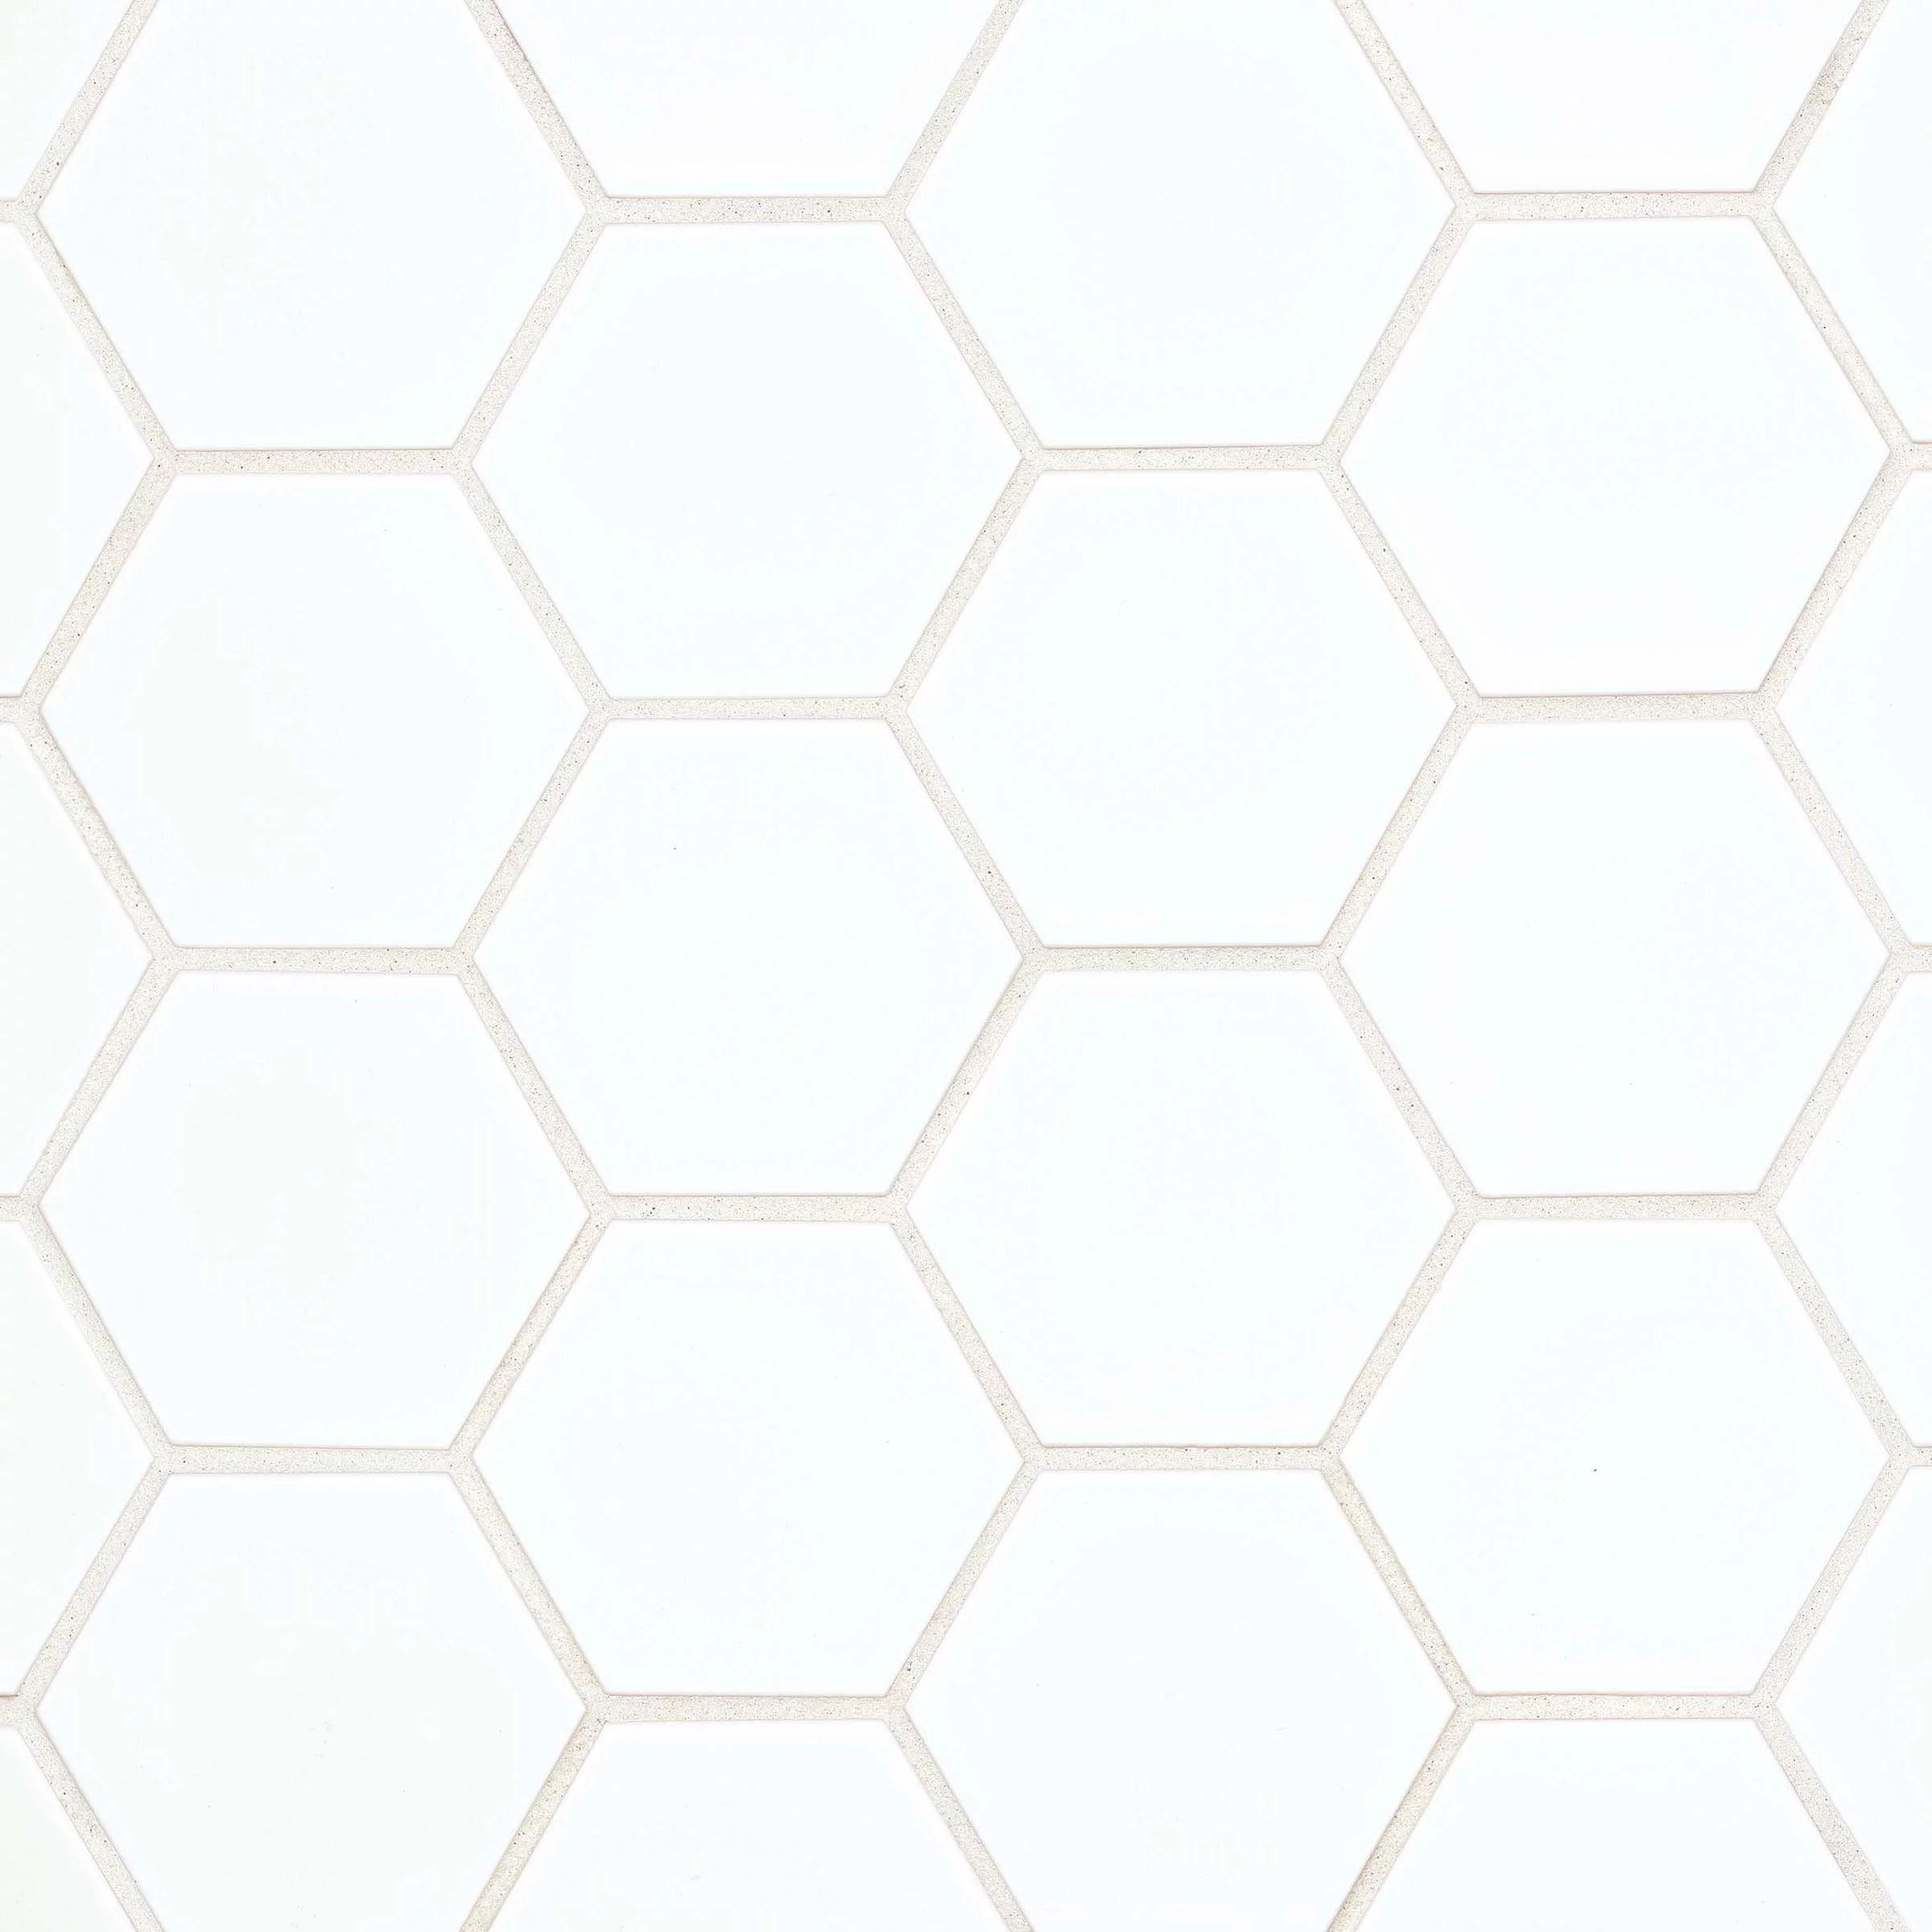 hedron 4 x 5 flat hexagon wall tile in gloss white 5 38 sqft ctn walmart com